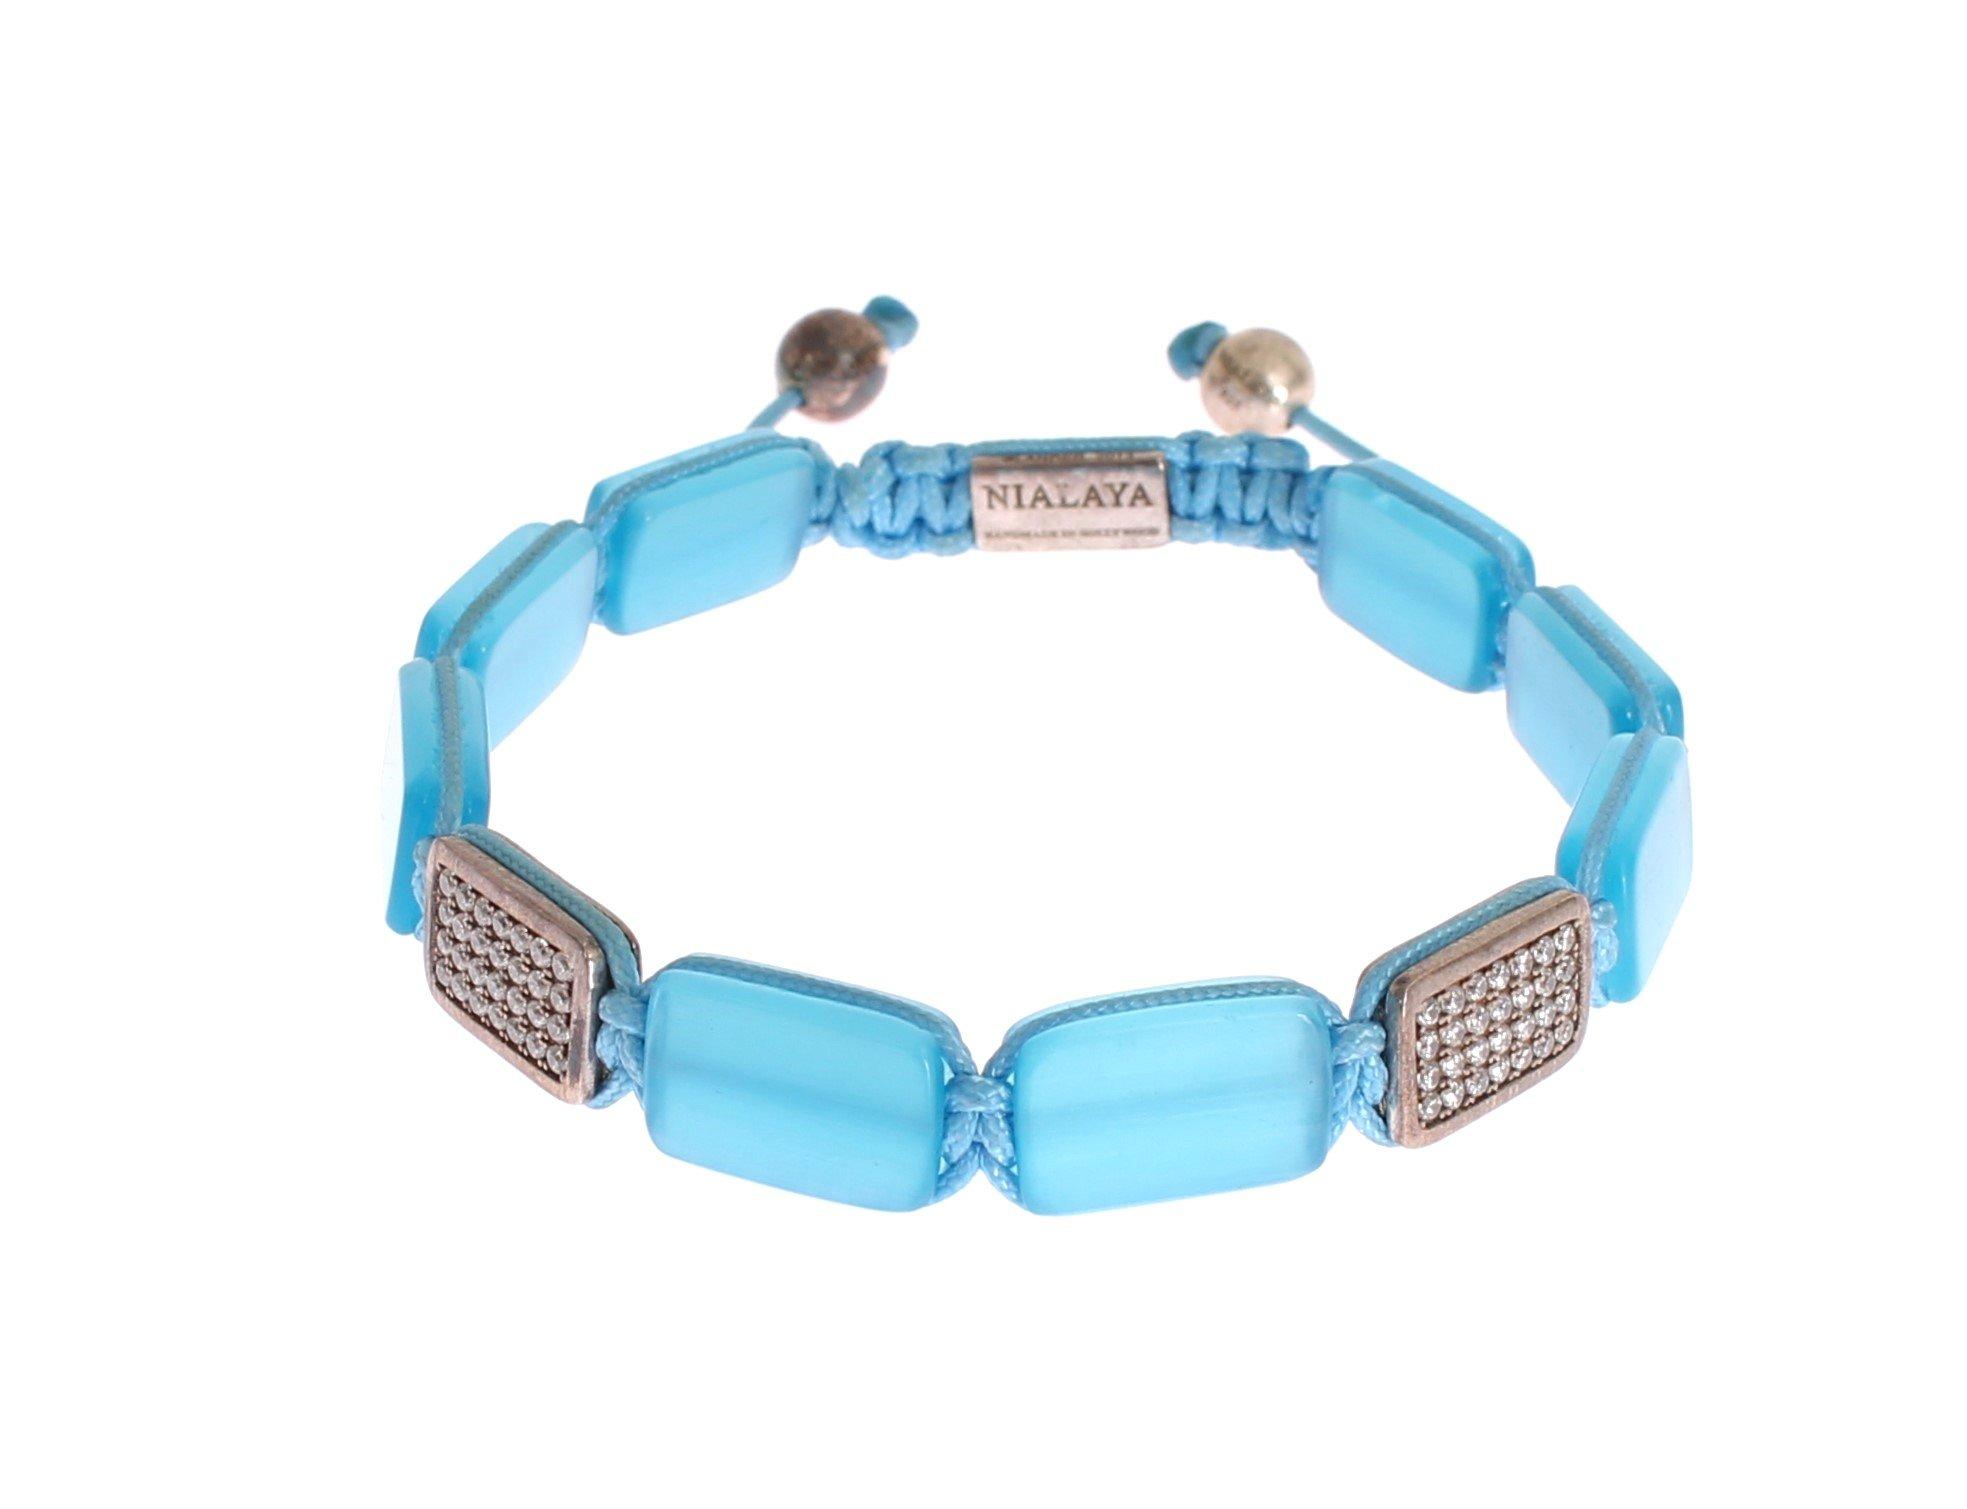 Nialaya Women's CZ Opal 925 Silver Bracelet Blue NIA20239 - L